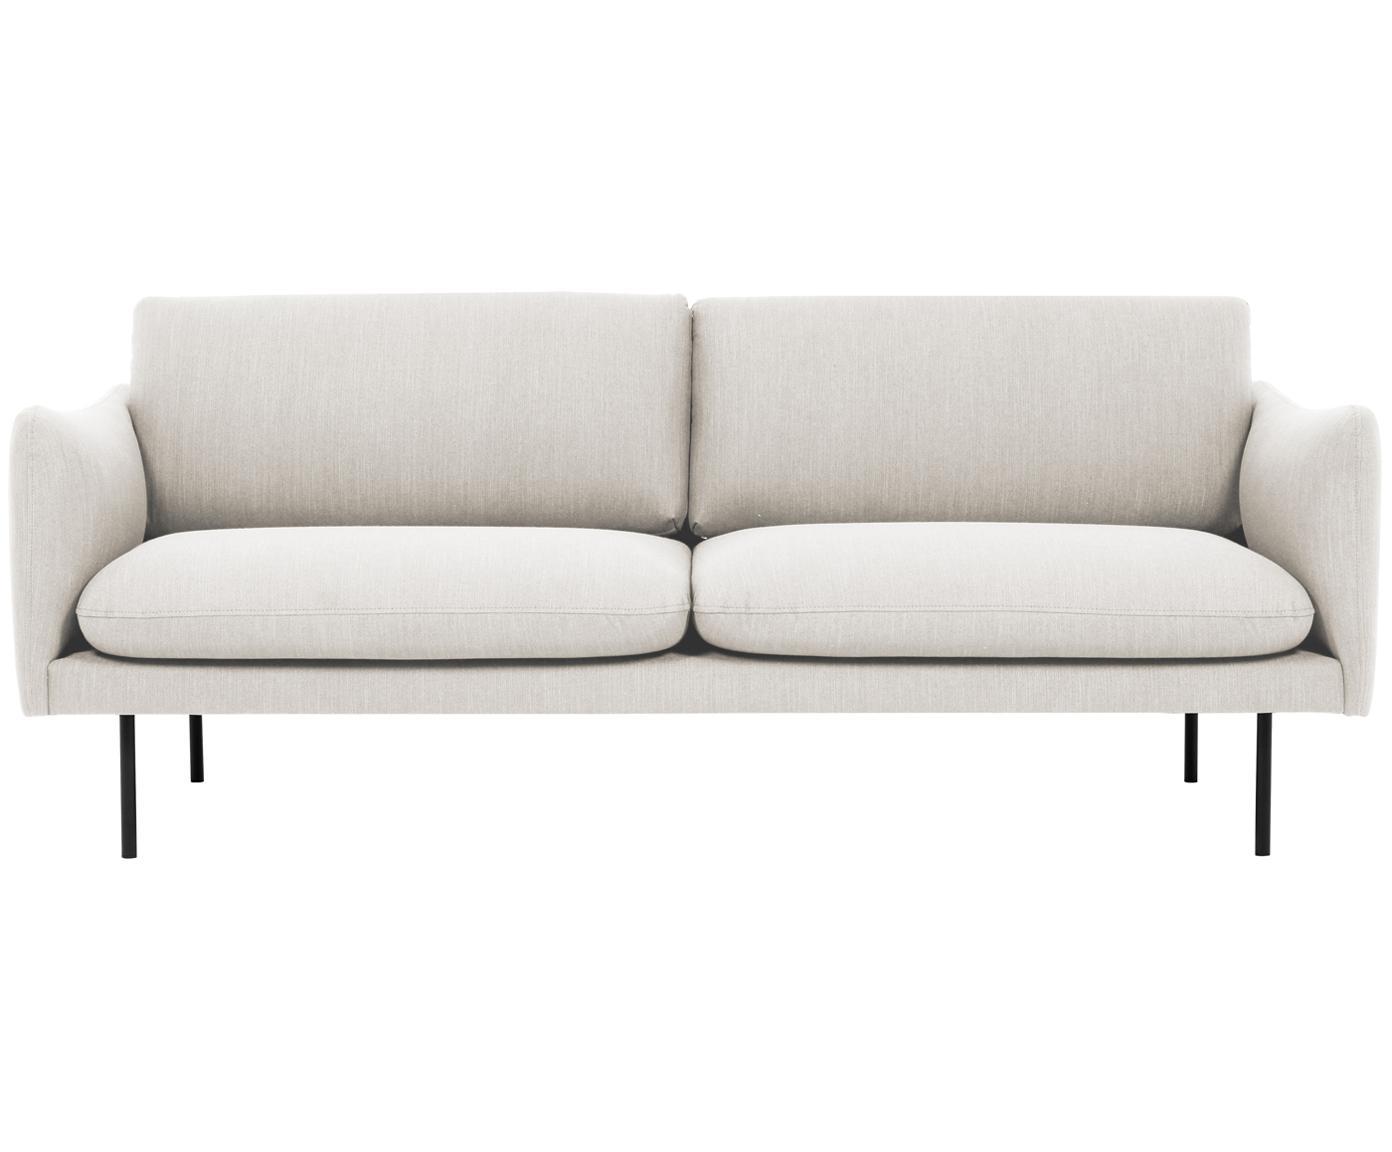 Sofa Moby (2-Sitzer), Bezug: Polyester 60.000 Scheuert, Gestell: Massives Kiefernholz, Webstoff Beige, B 170 x T 95 cm